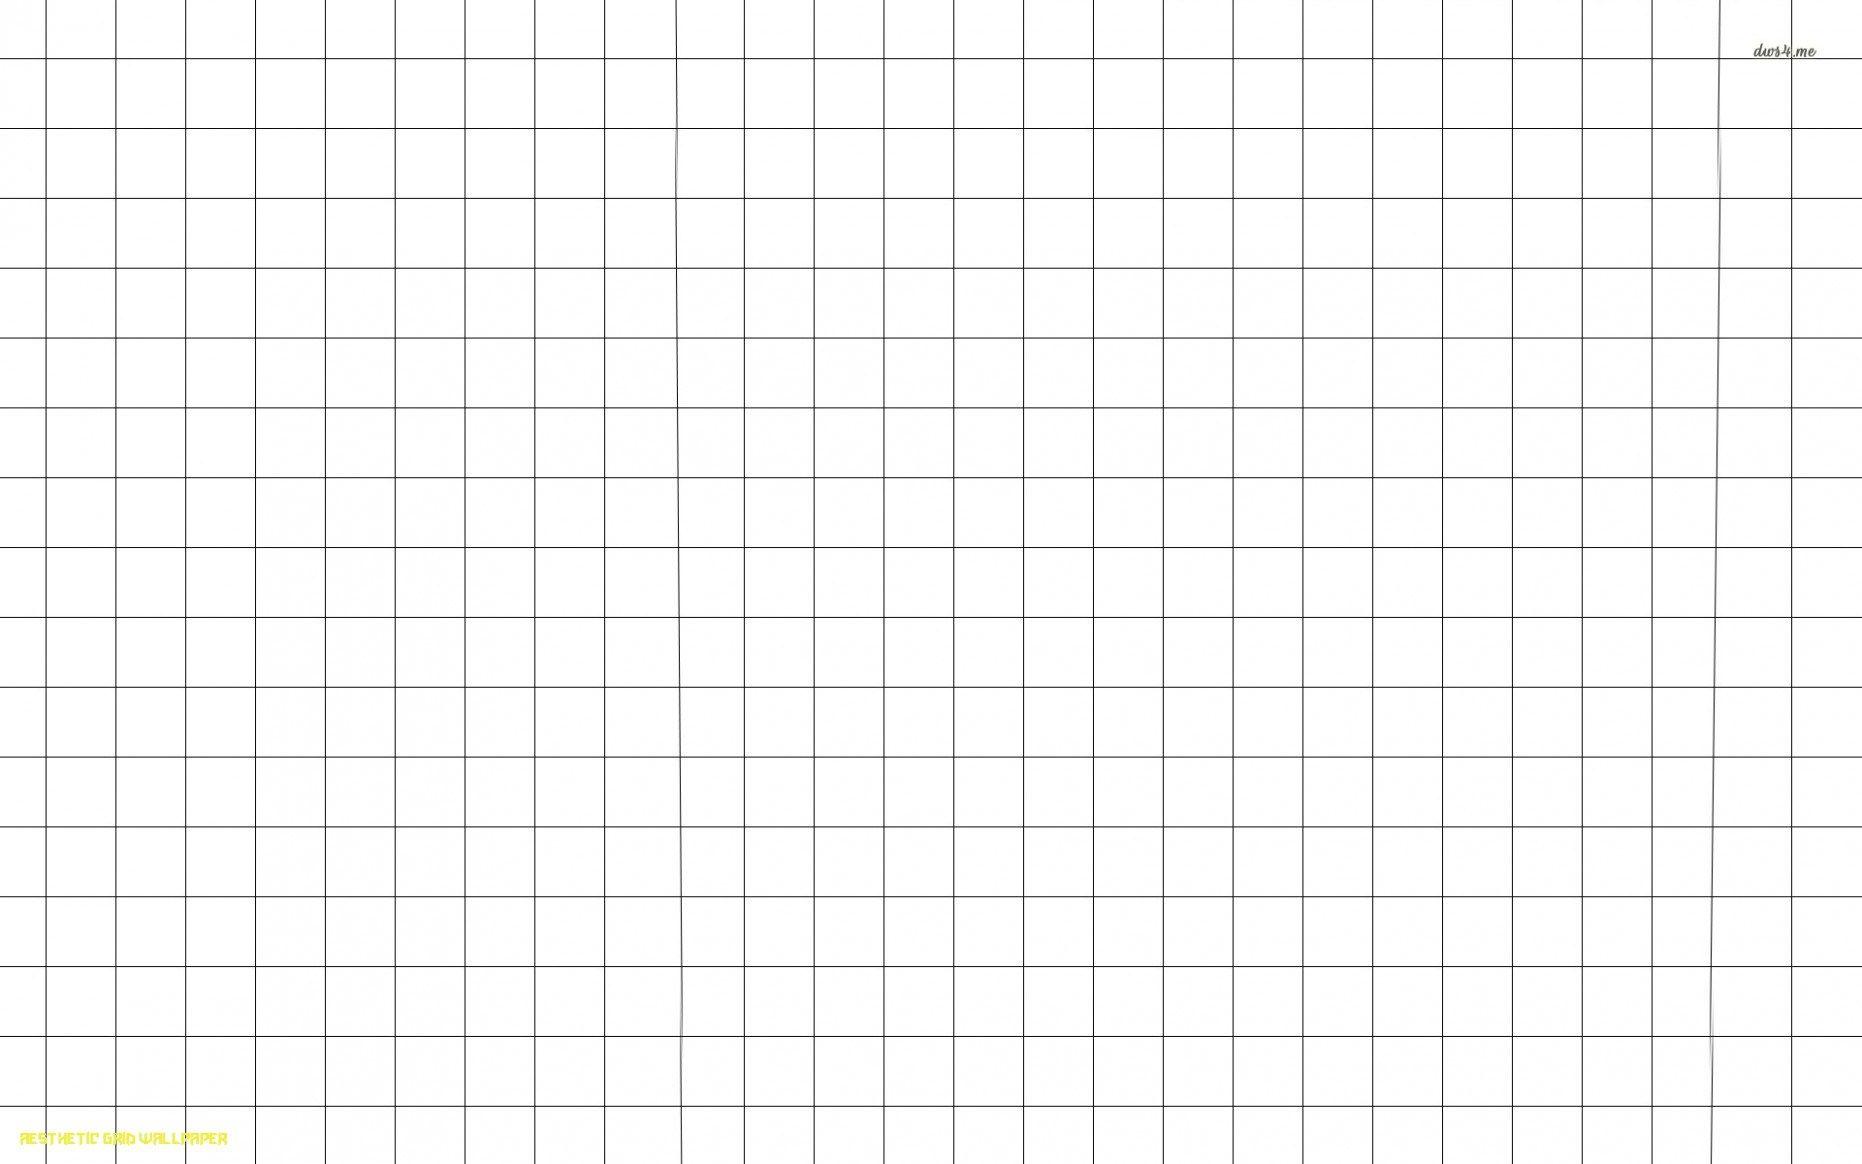 Aesthetic Tumblr Grid Wallpapers   Top Aesthetic Tumblr Grid 1862x1164